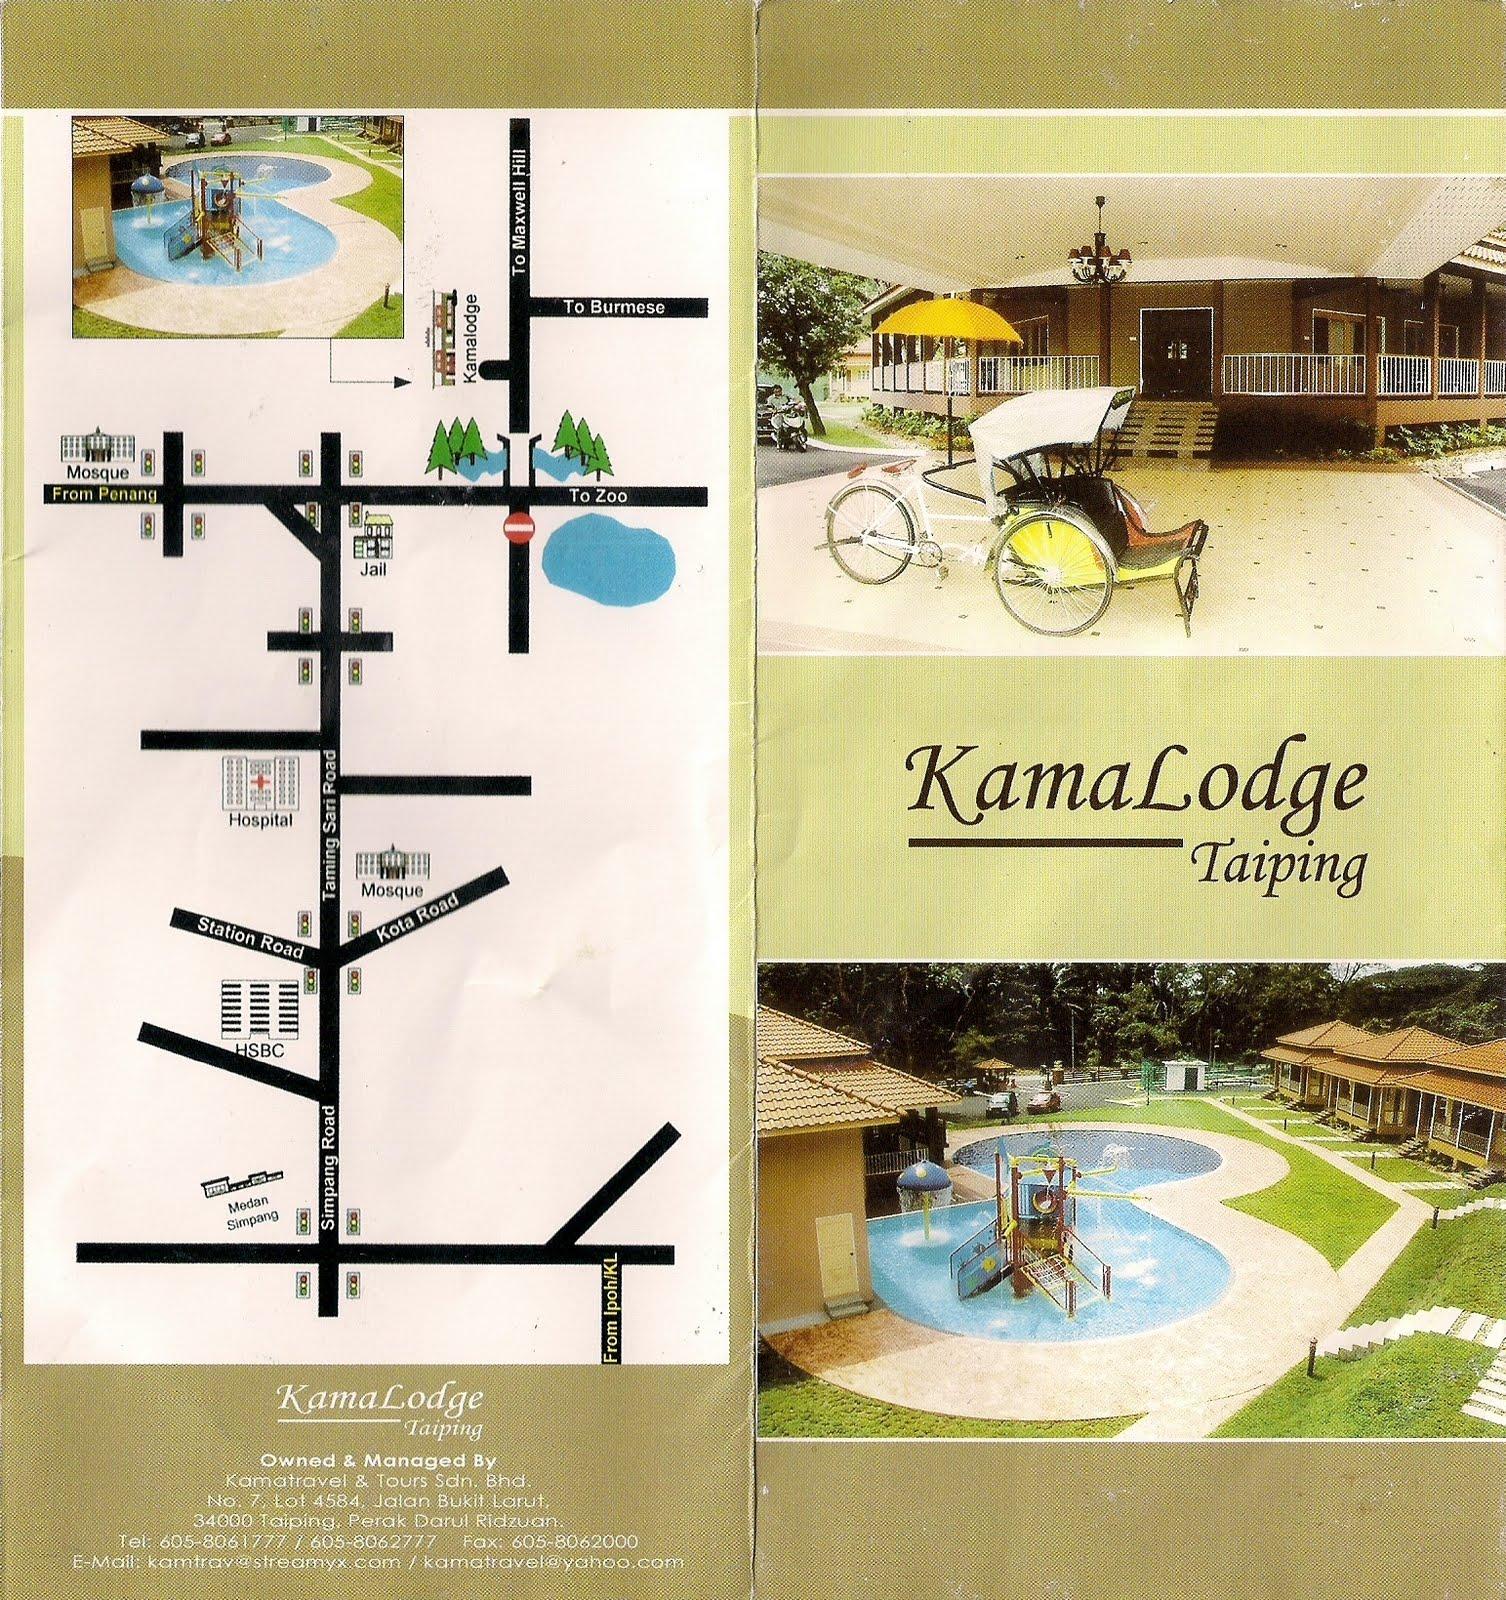 Jeejoun Travel Kamalodge Taiping